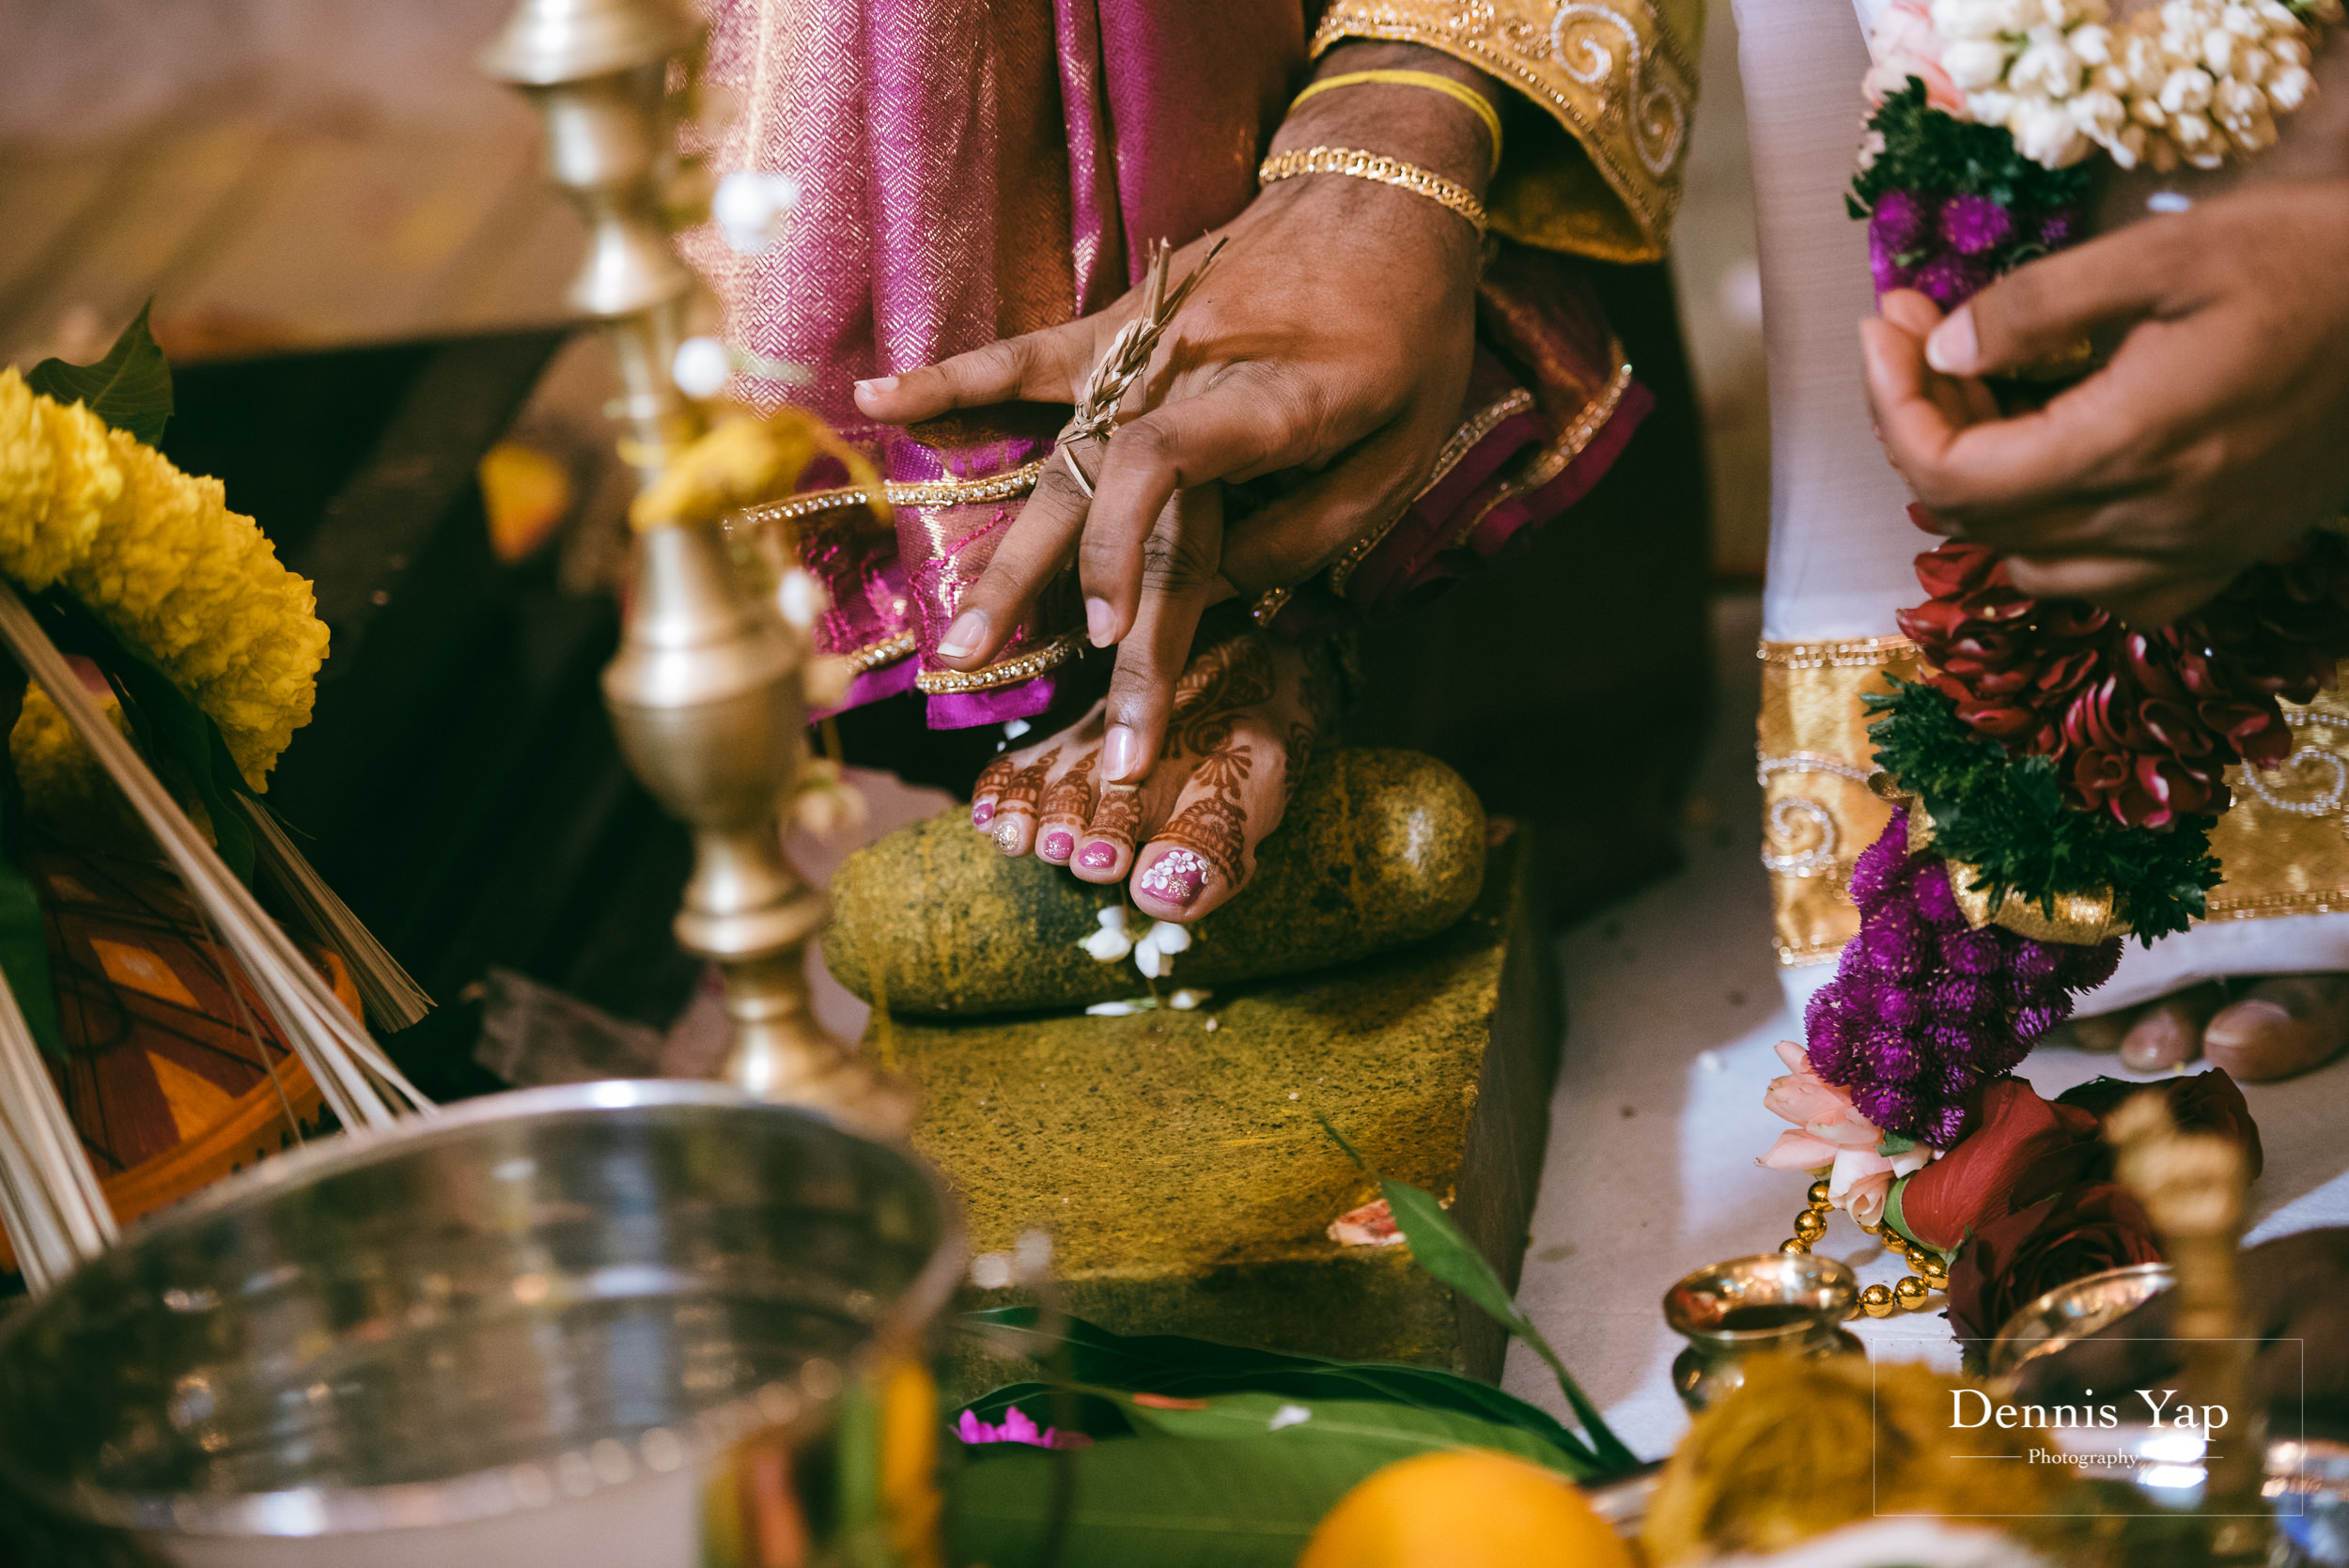 puvaneswaran cangitaa indian wedding ceremony ideal convention dennis yap photography malaysia-29.jpg